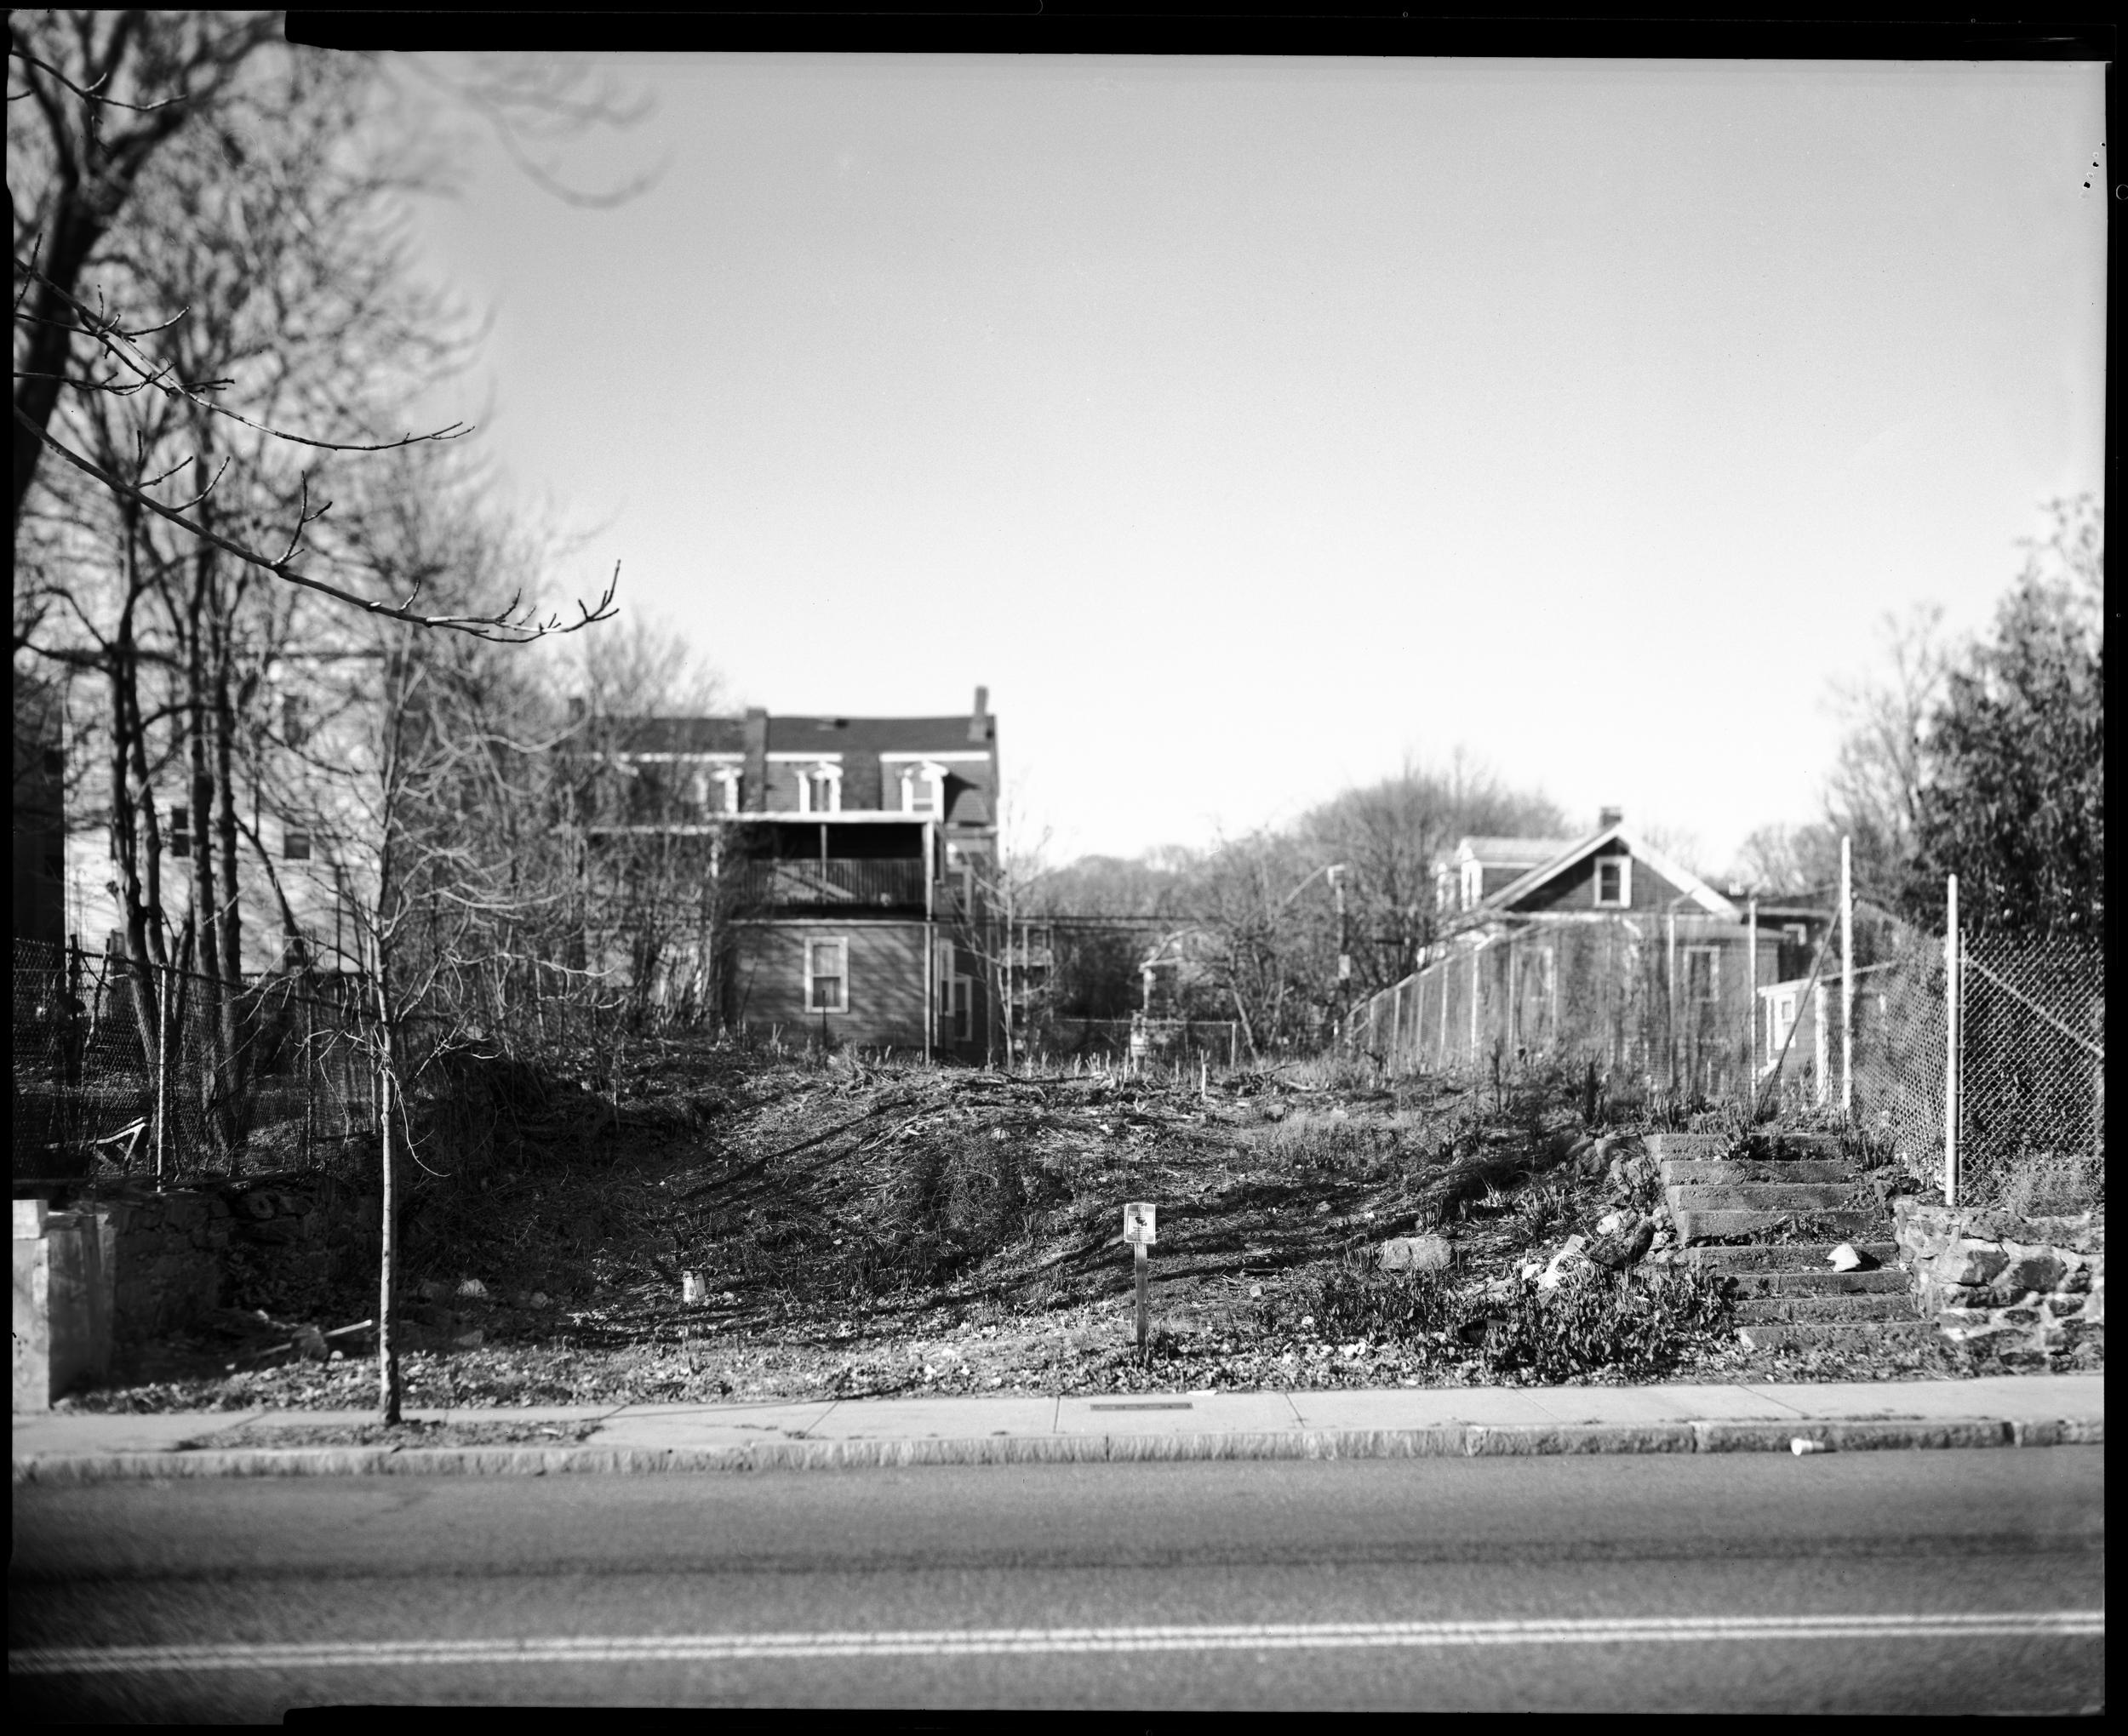 2729 Washington St., Fort Hill, Roxbury, MA, 2015